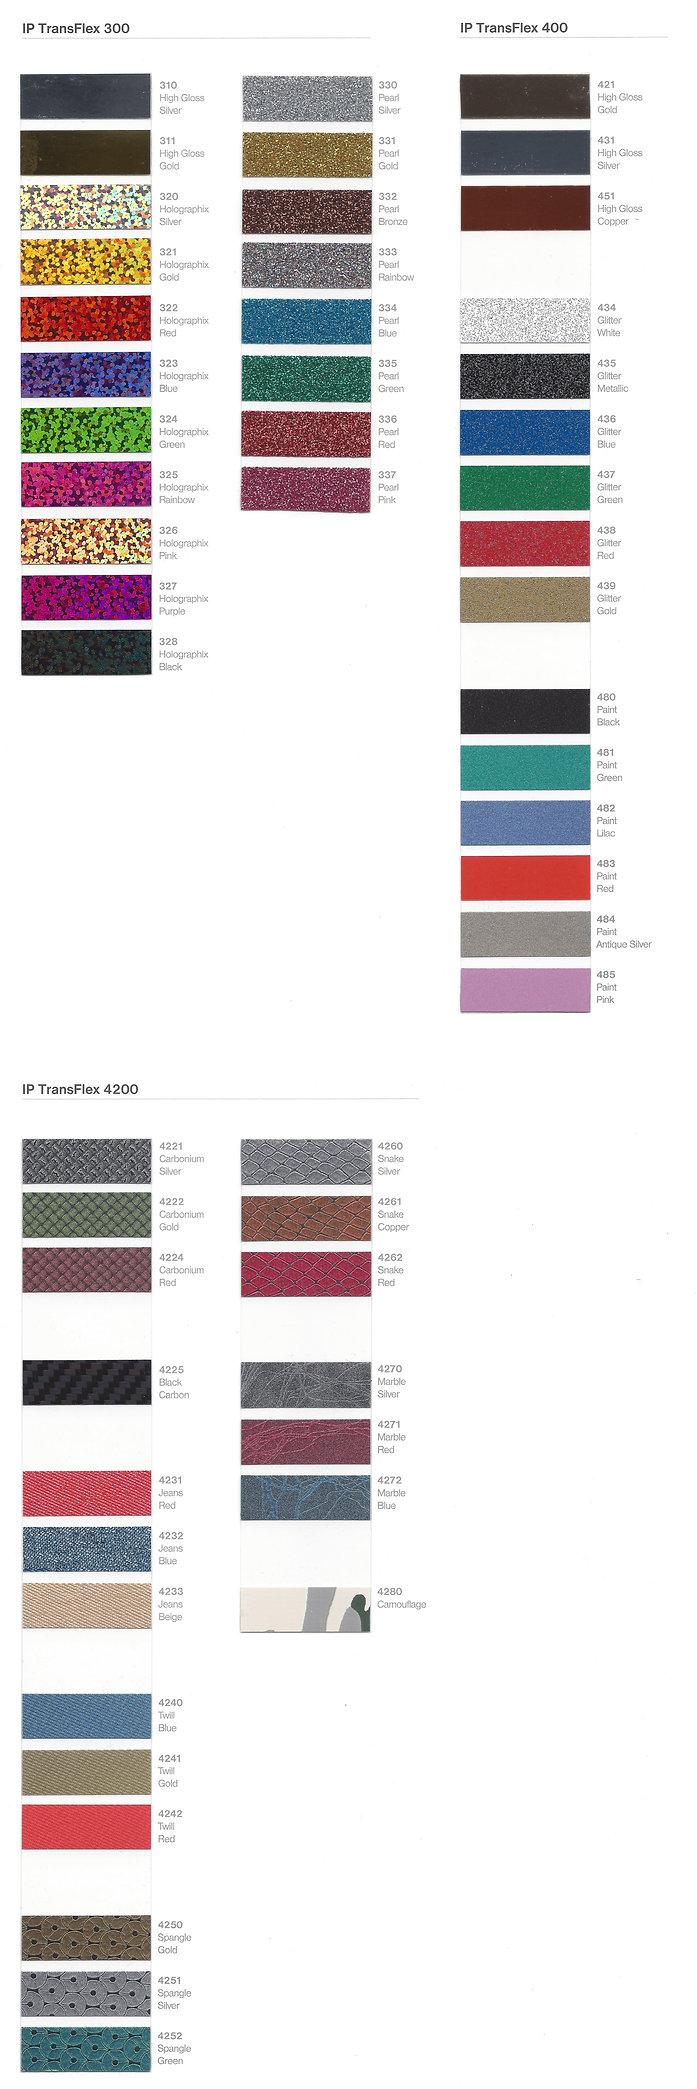 IP Transflex 300 / 400 Folien Fashion